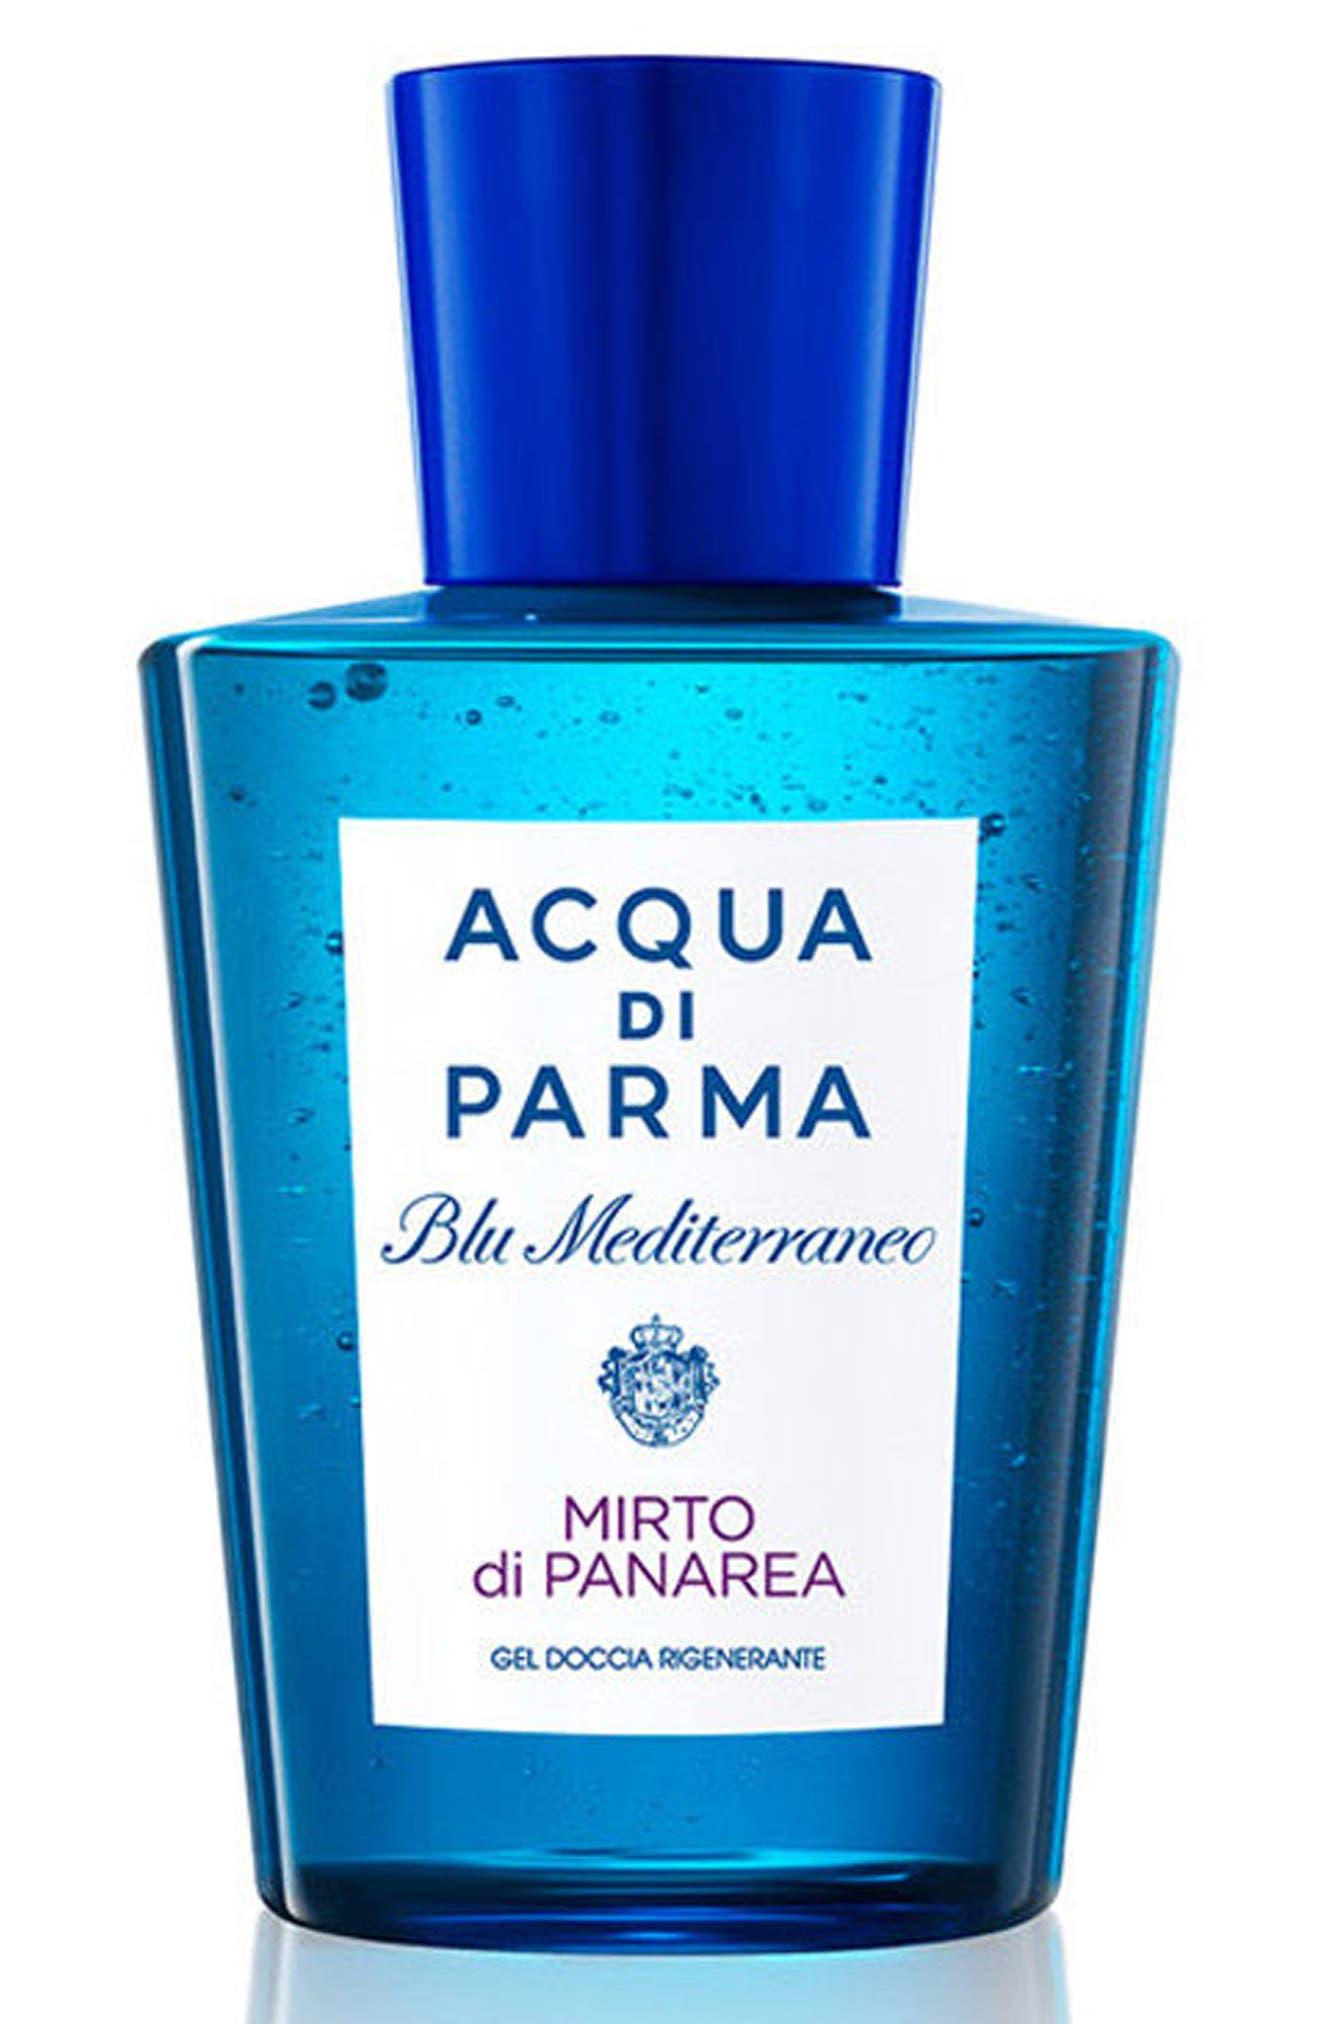 Alternate Image 1 Selected - Acqua di Parma 'Blu Mediterraneo - Mirto di Panarea' Shower Gel